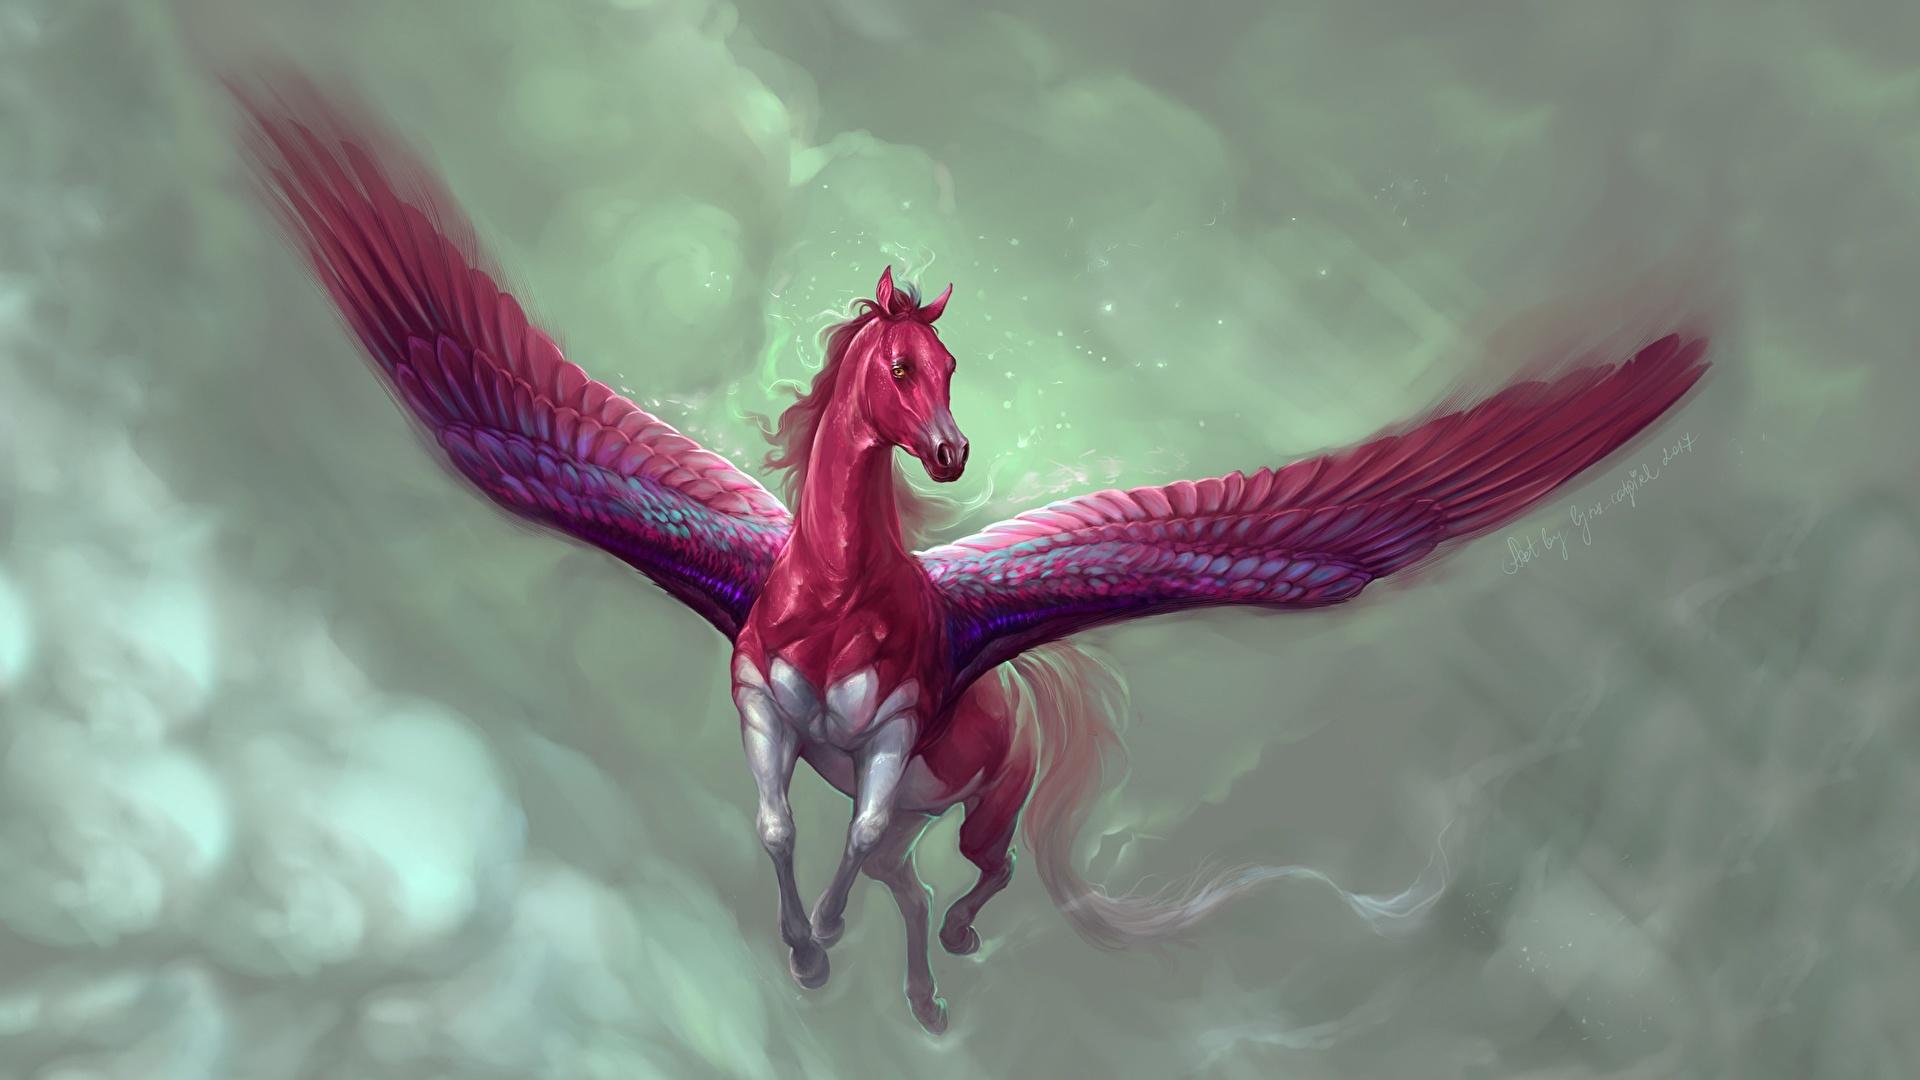 Desktop Wallpapers Pegasus By Marianna Gadzhy Marianna